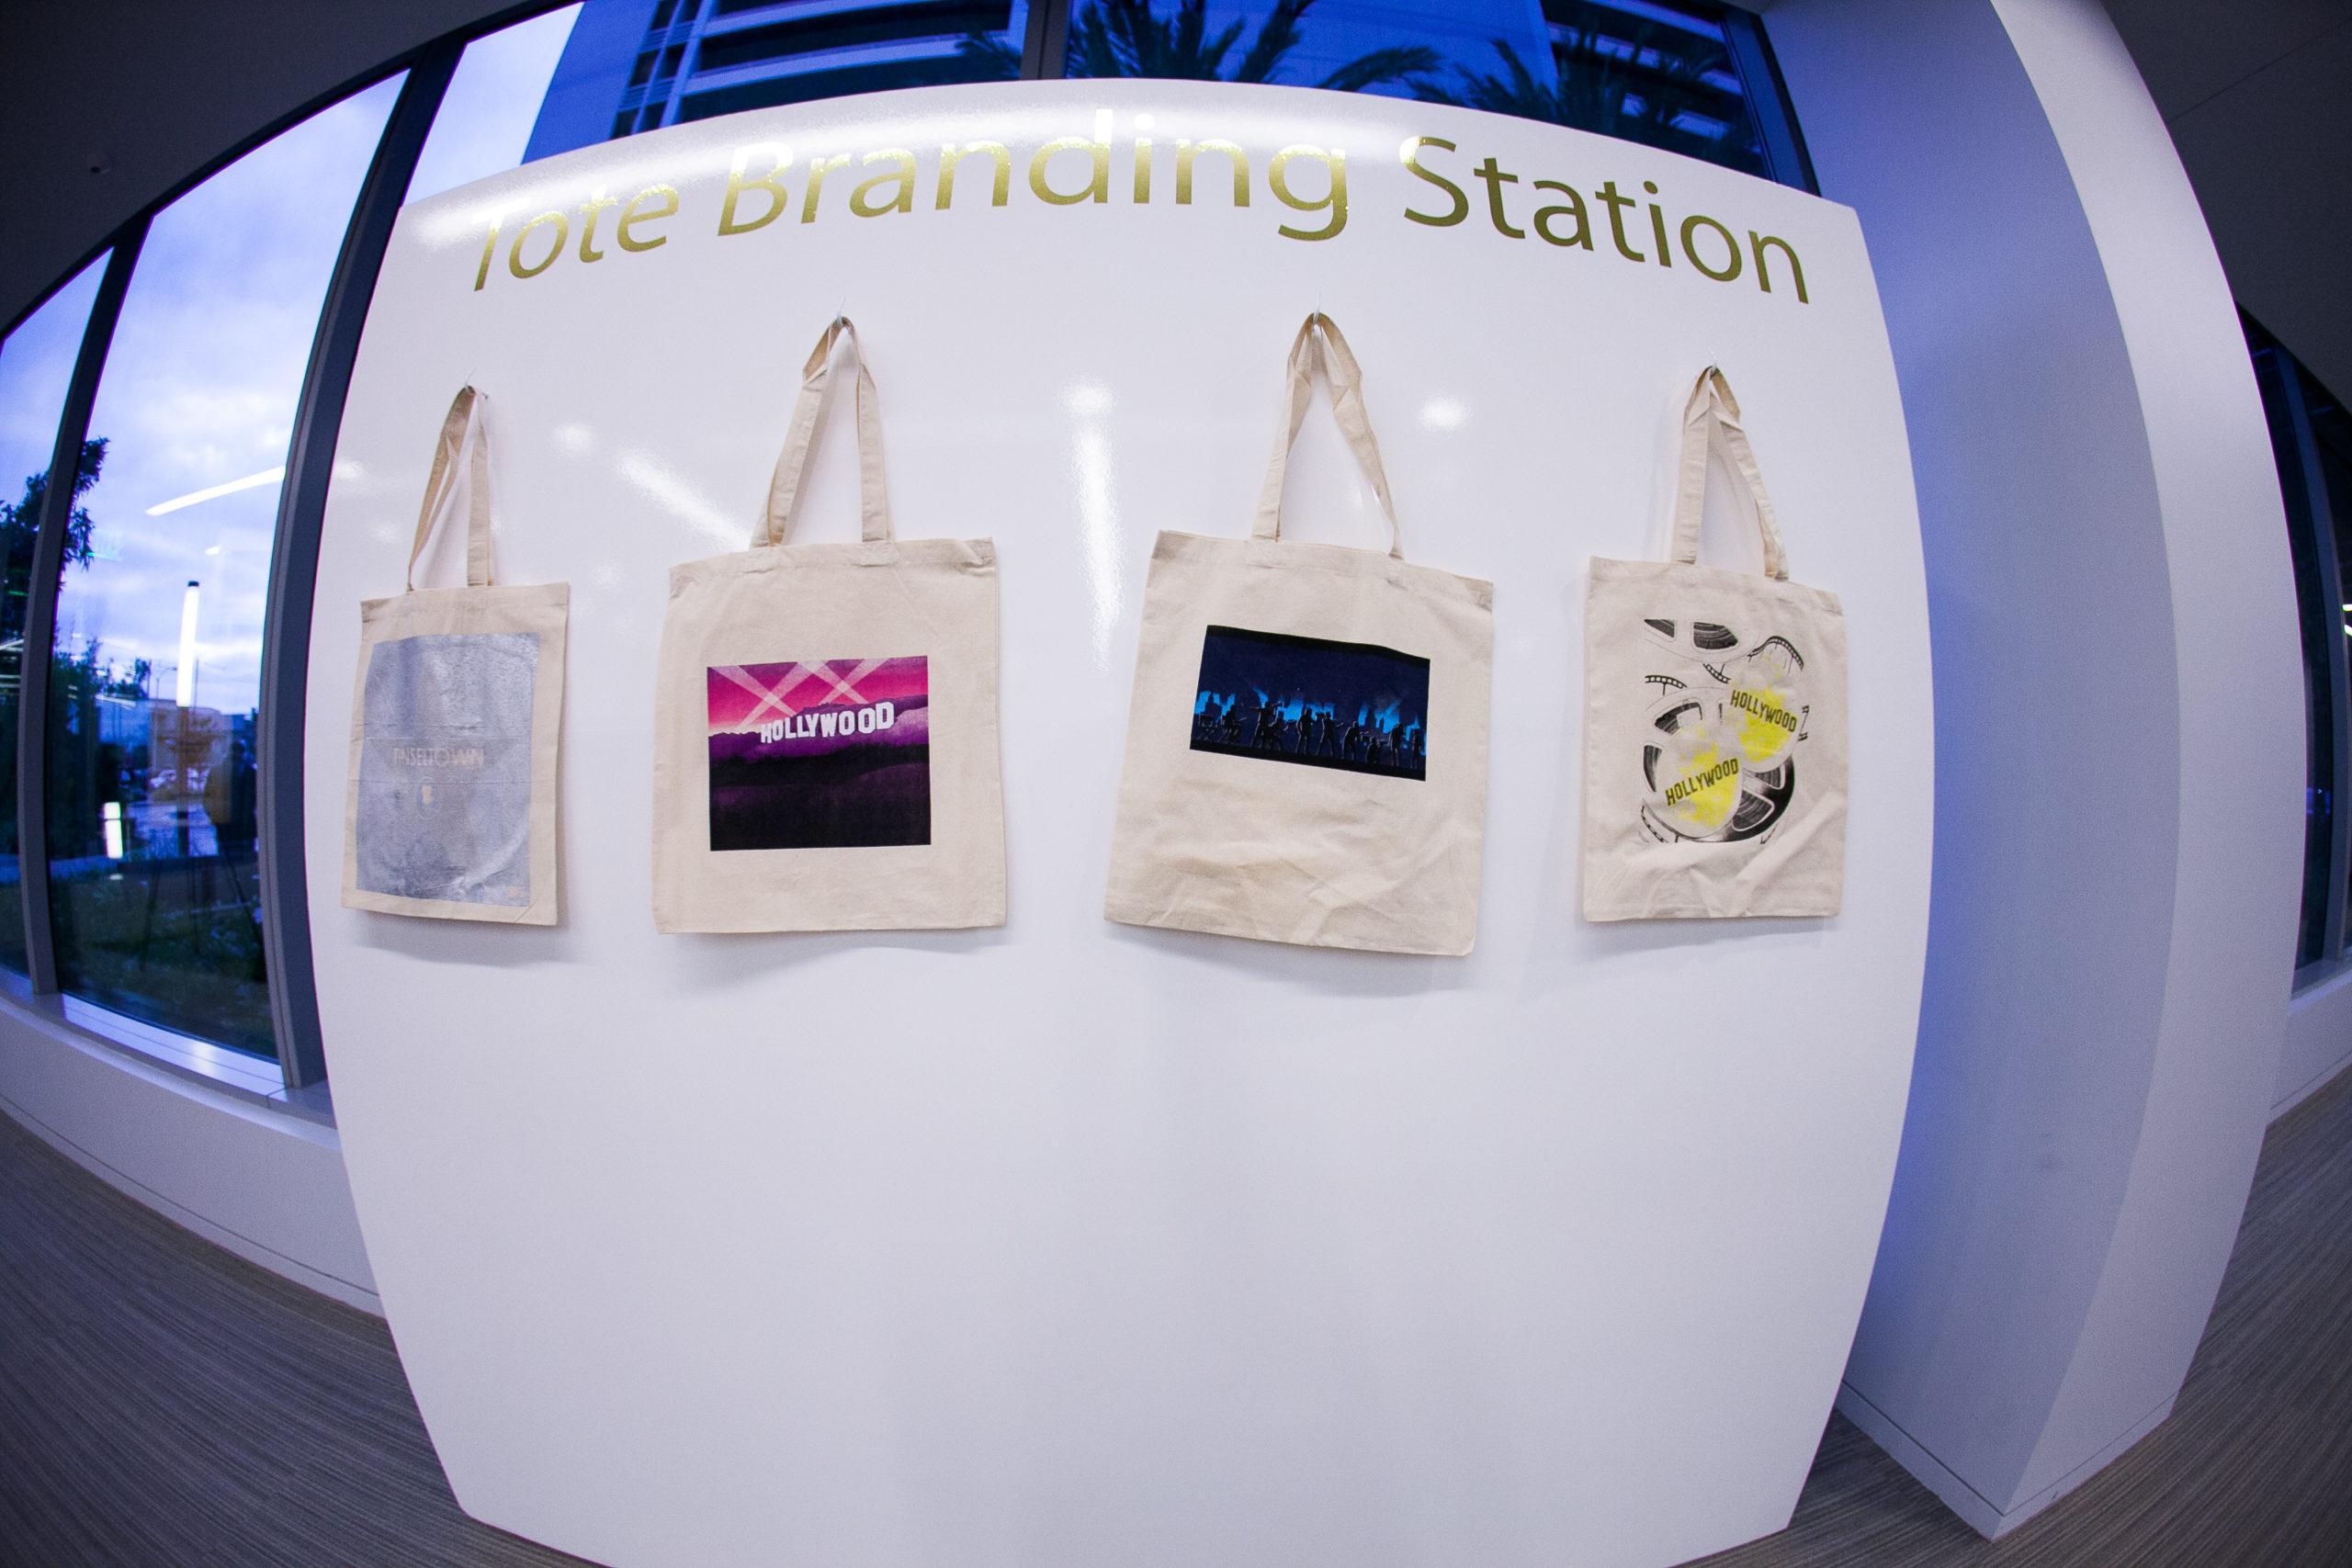 Tote-Bag-Branding-Station